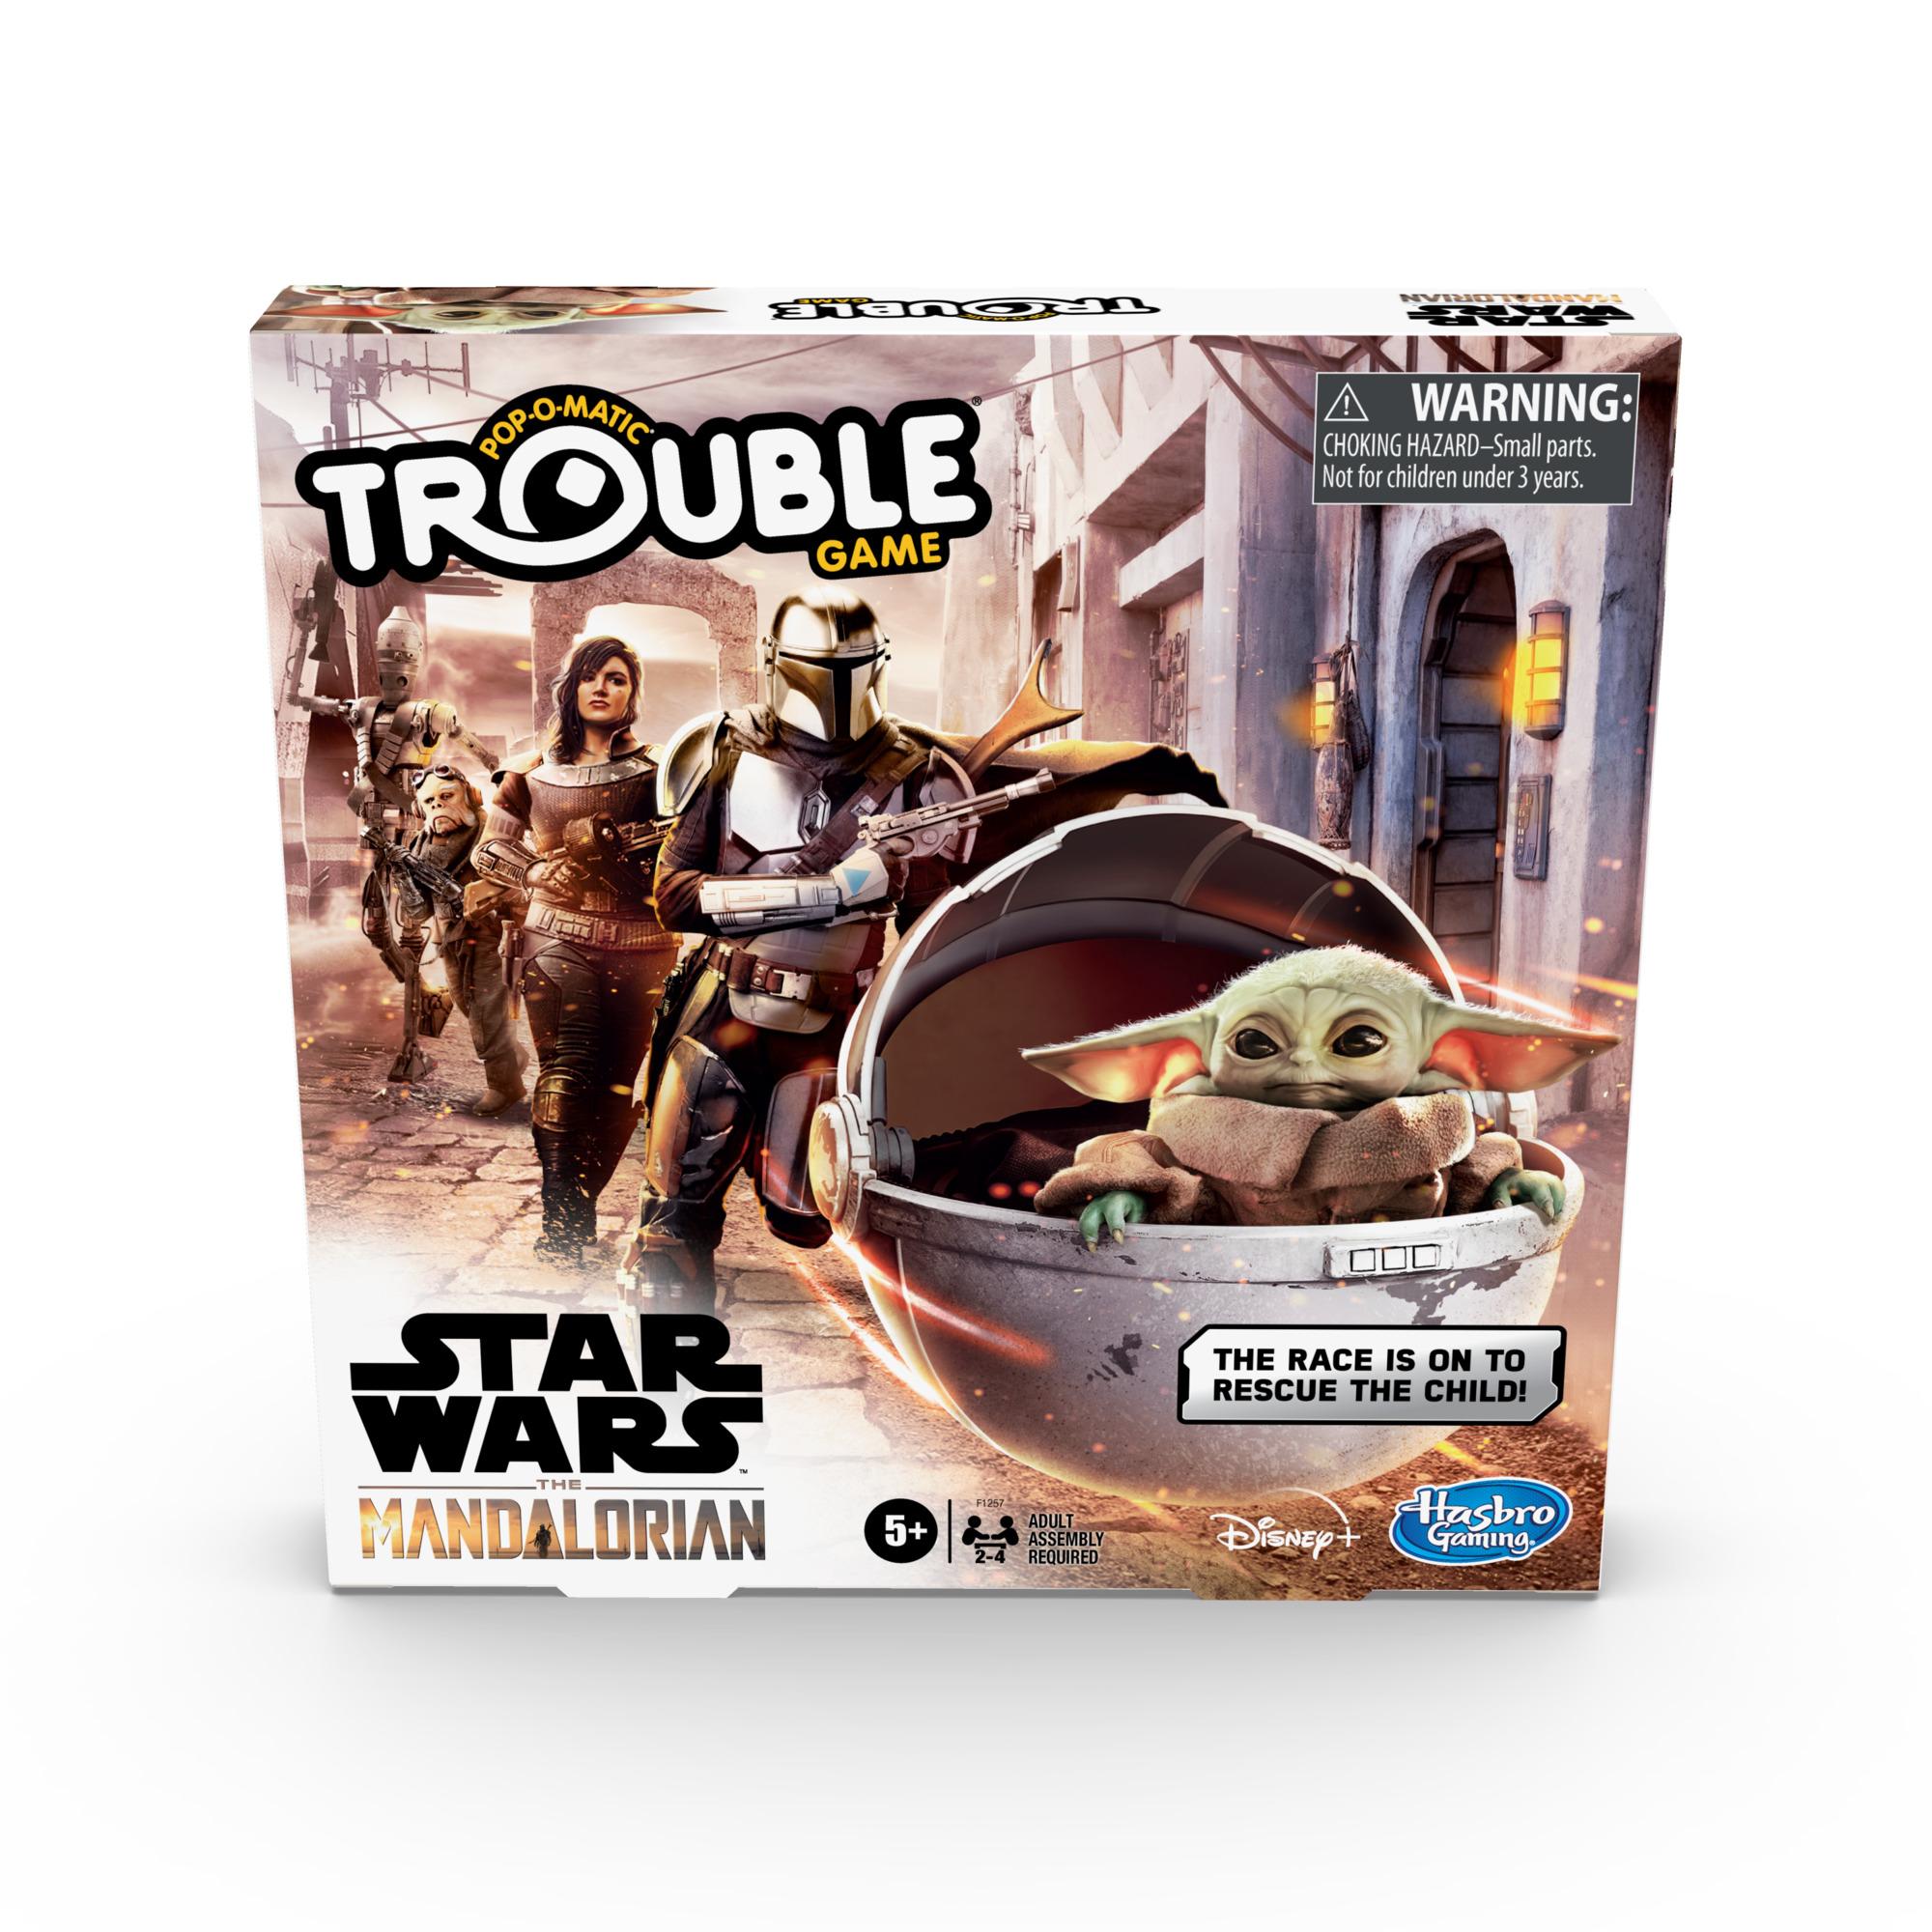 F12570000 Star Wars The Mandalorian Trouble Game pkg 3